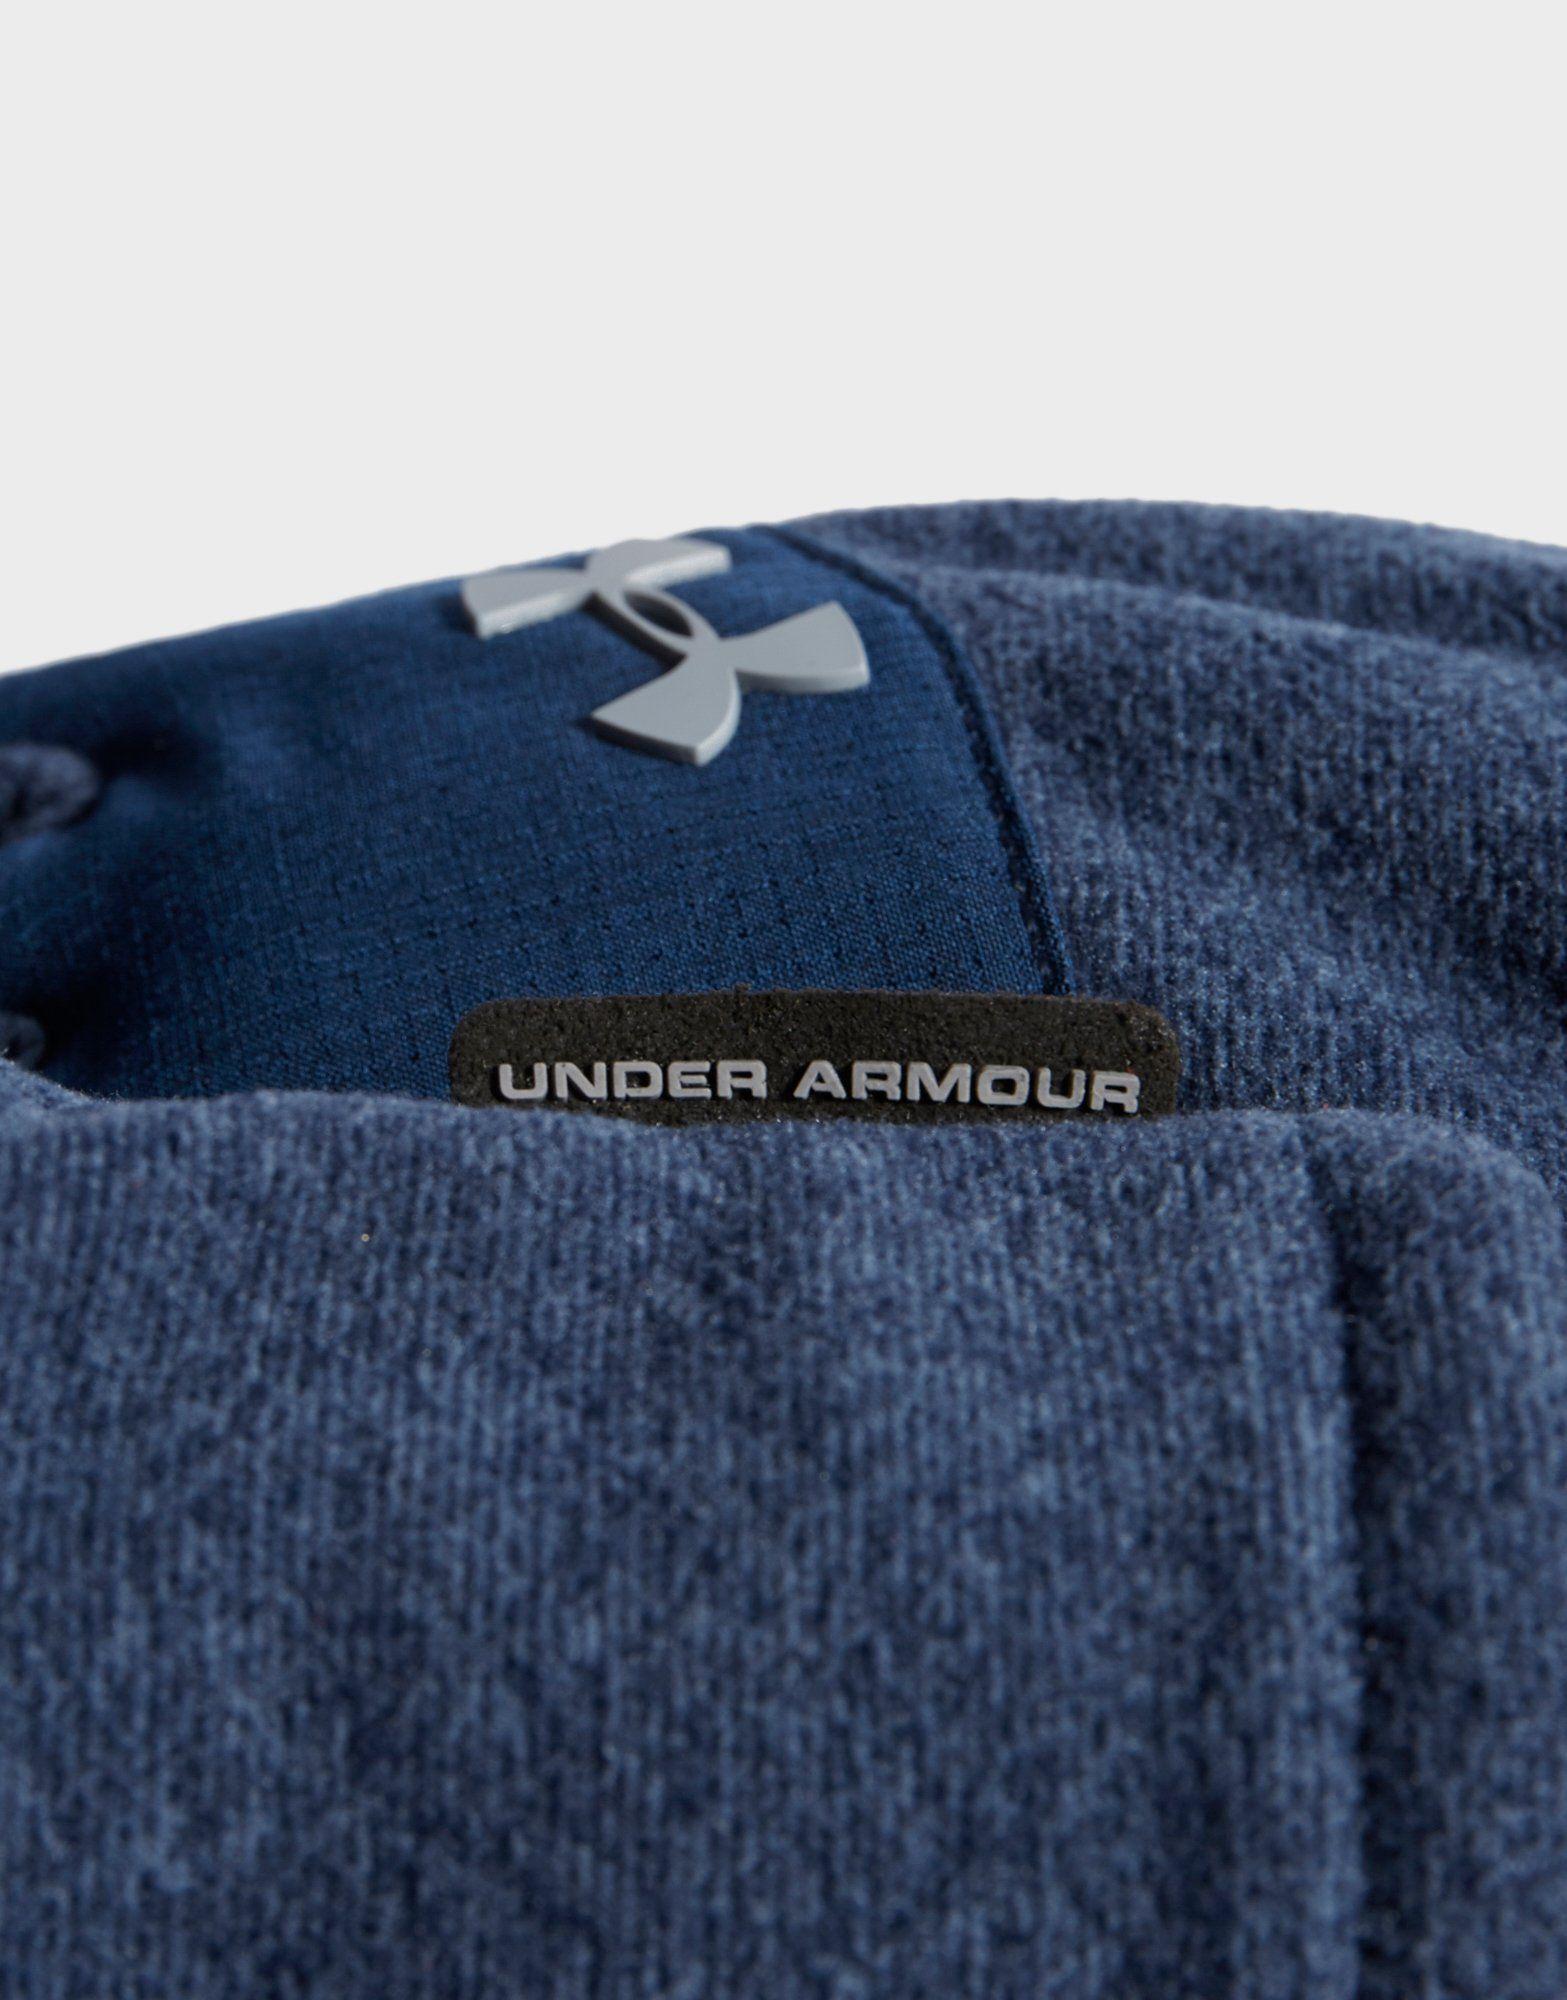 Under Armour Fleece Gloves 2.0